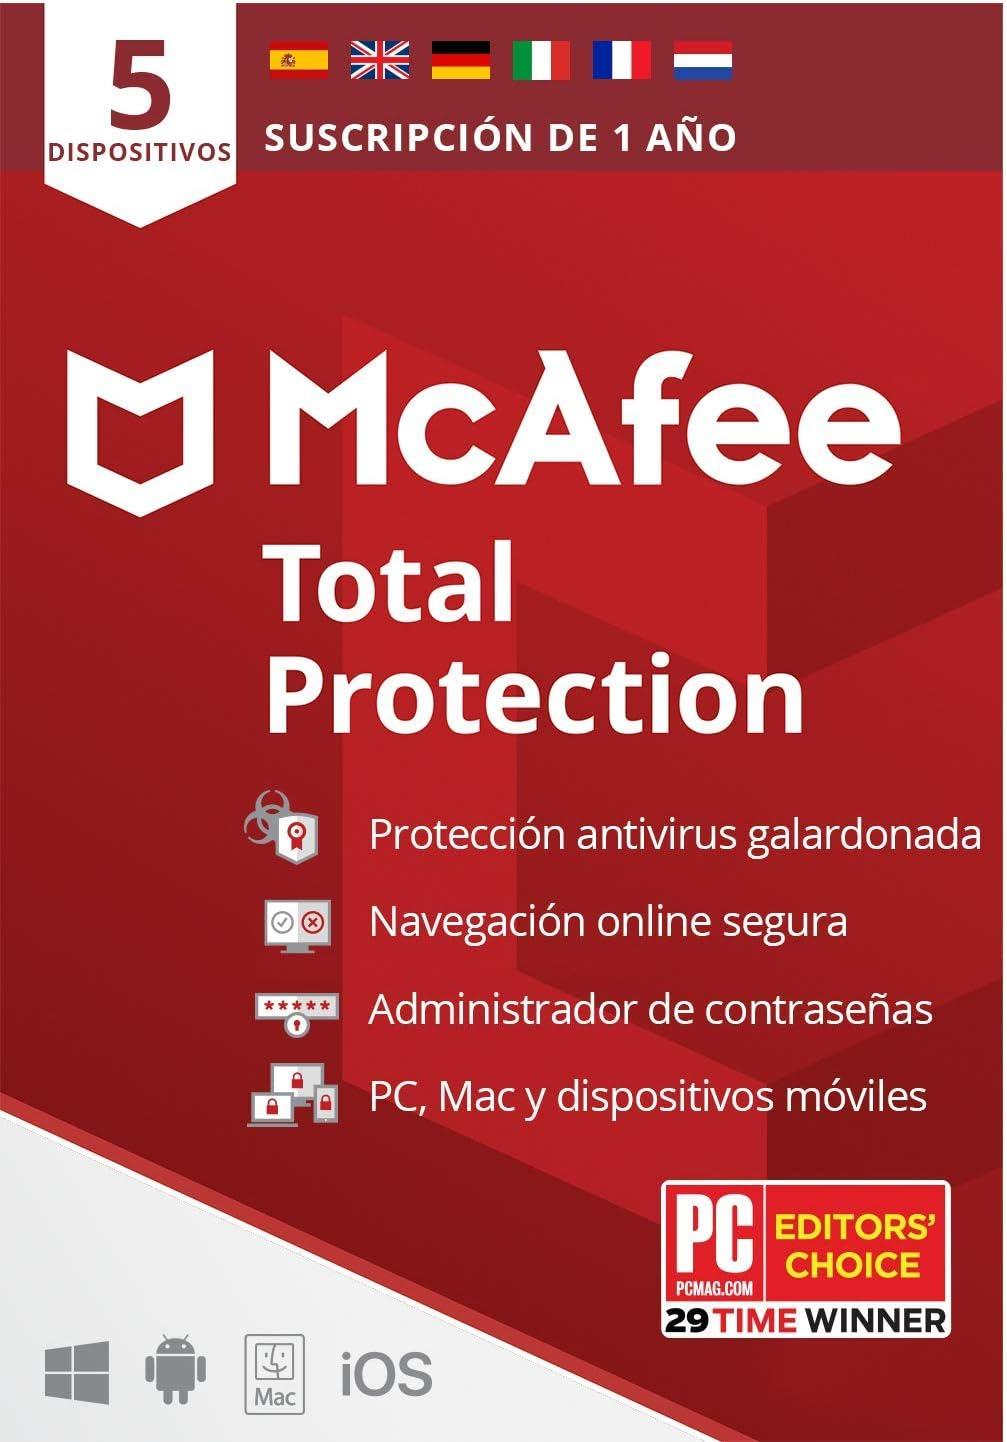 McAfee Total Protection 2021, 5 Dispositivos, 1 Año, Software Antivirus, Seguridad de Internet, Móvil, Manager de Contraseñas, Compatible con PC/Mac/Android/iOS, Edición Europea, Código por Correo